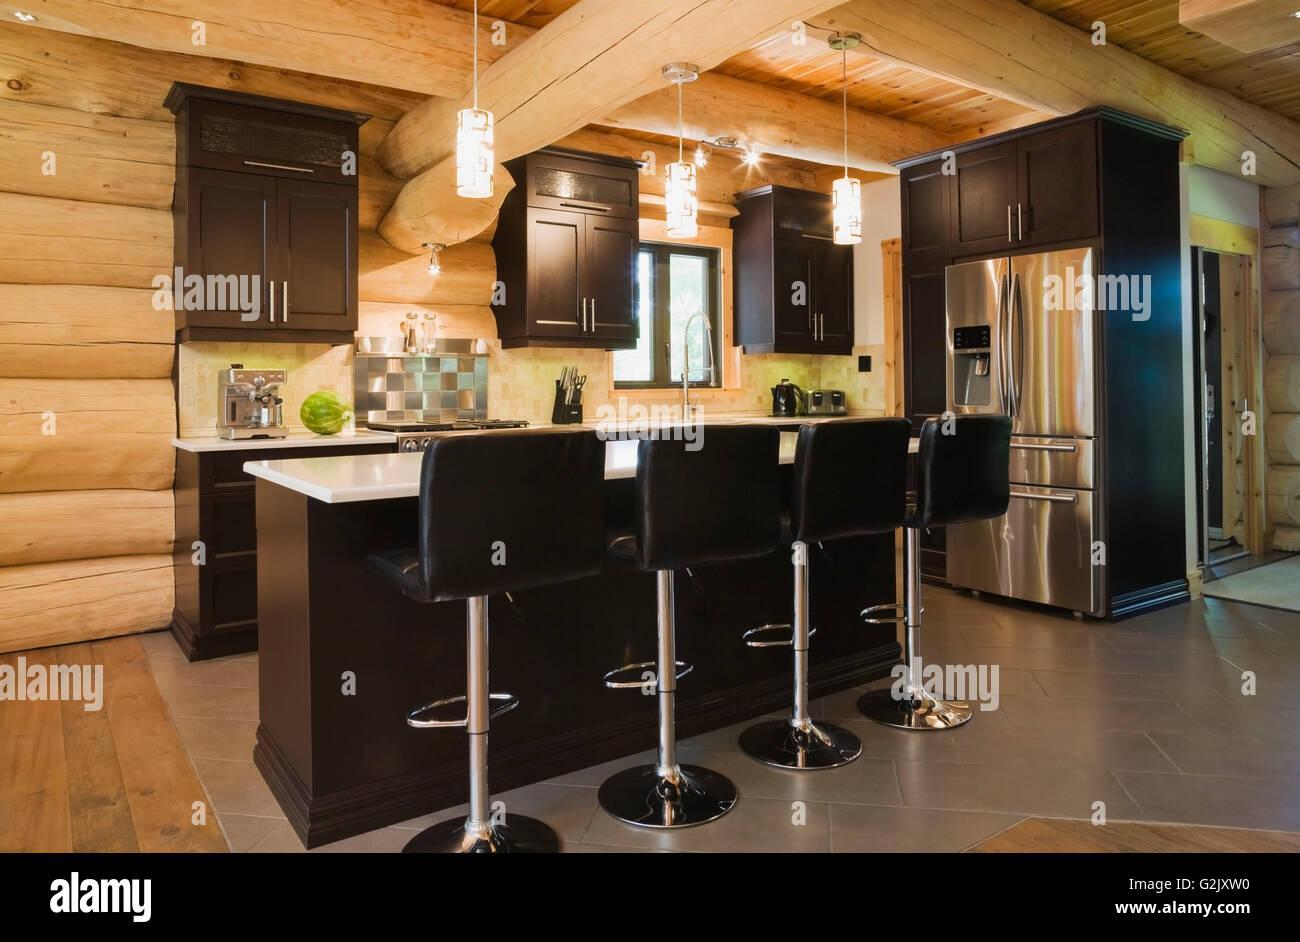 White Quartz Countertop Island Black Leather Bar Chairs In Kitchen